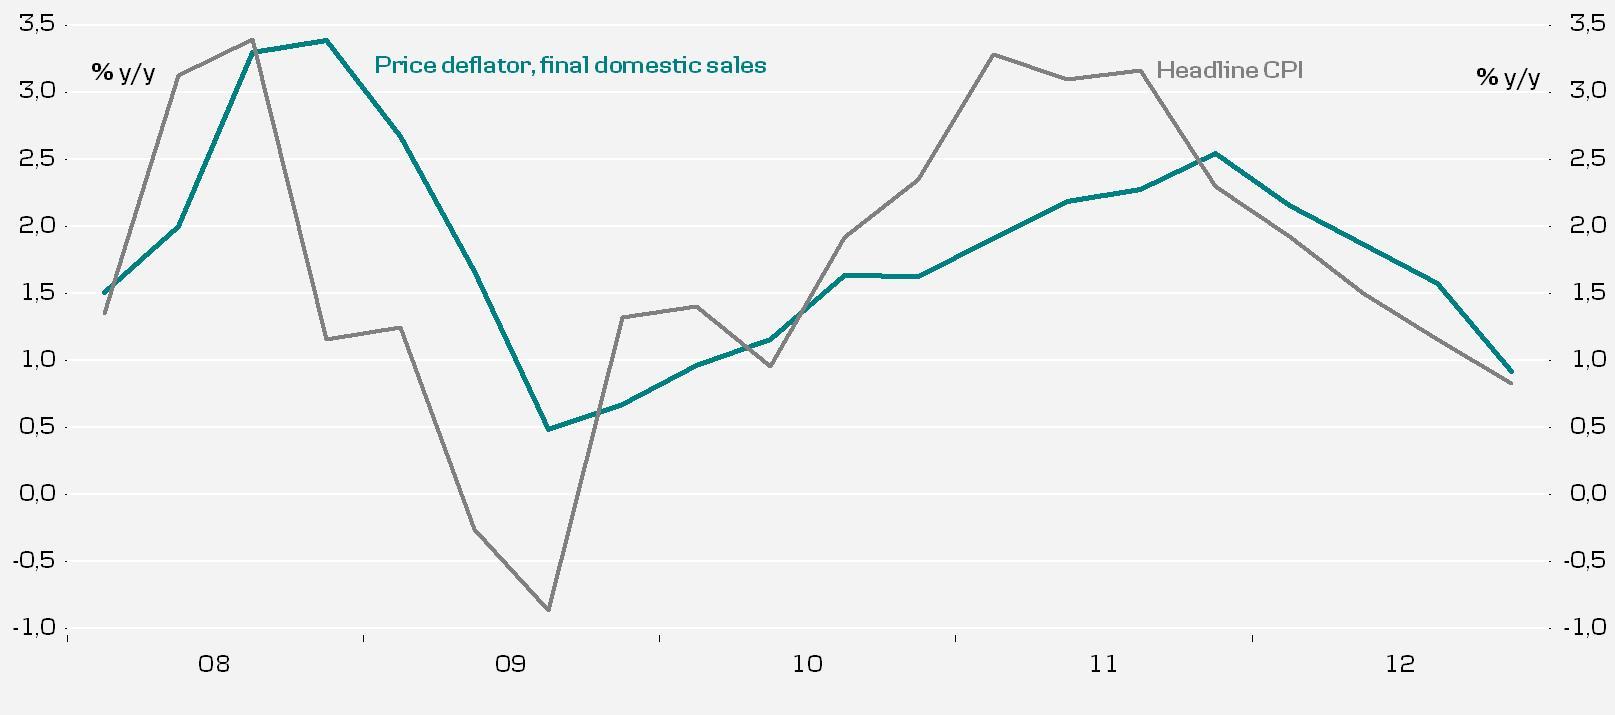 2008 was a large negative demand shock